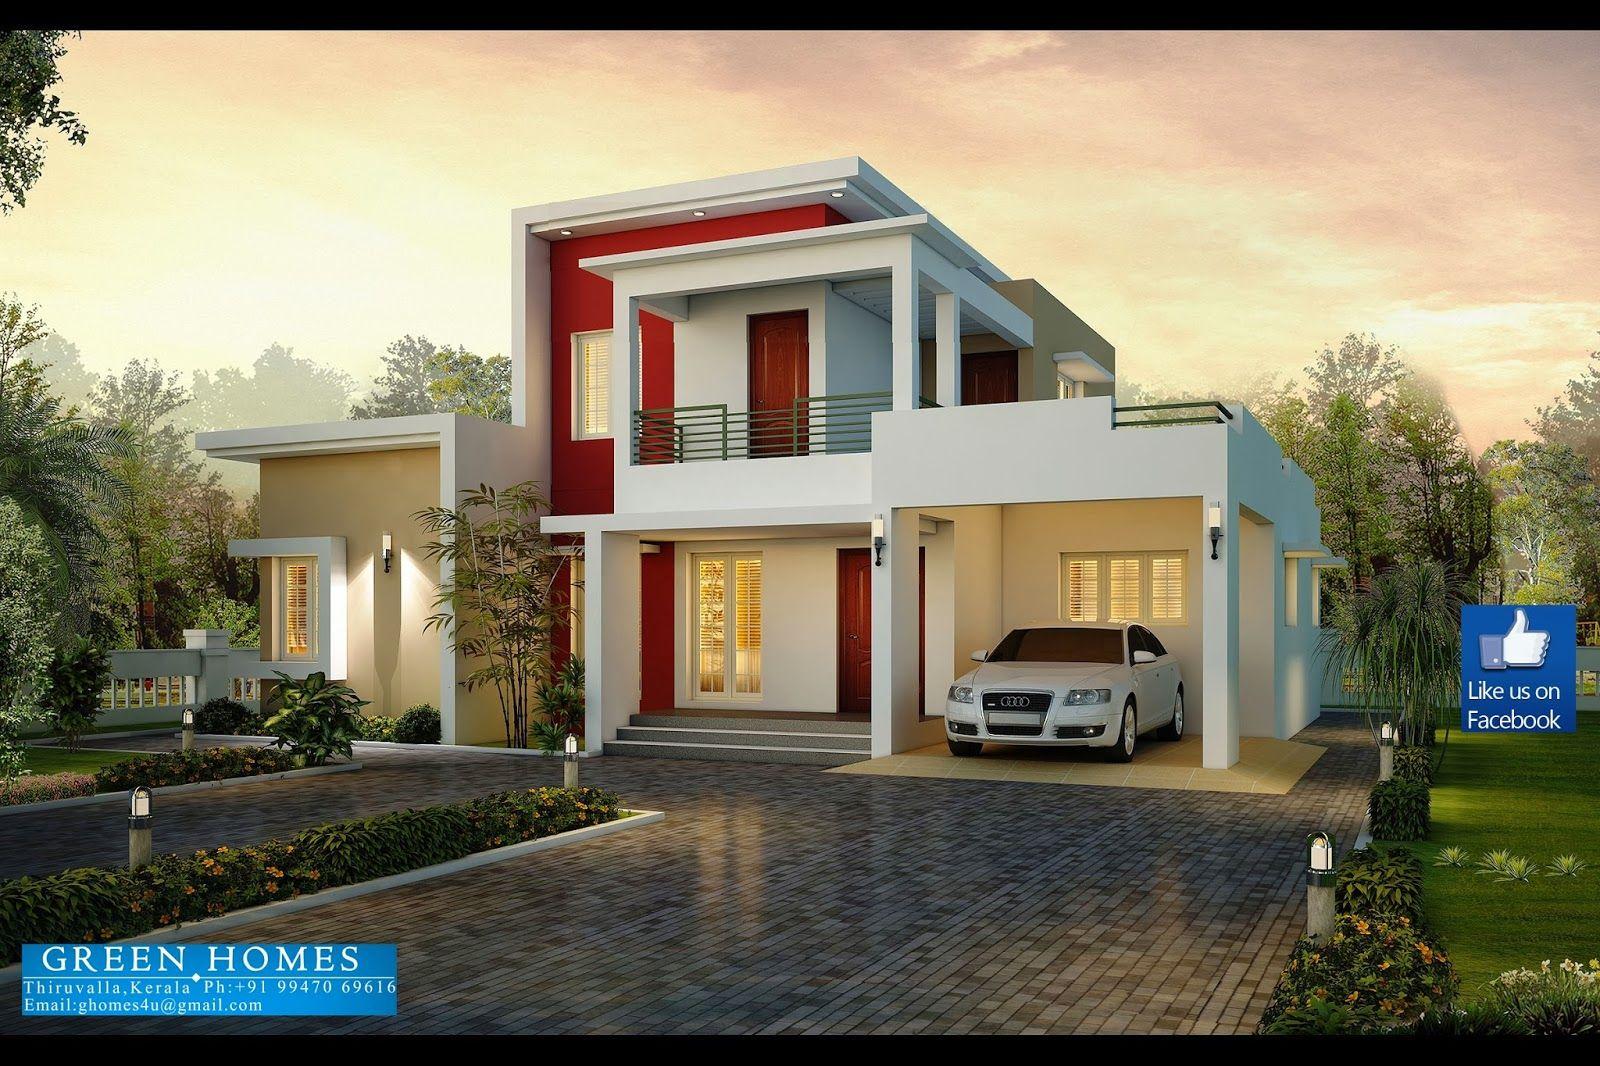 3 Bedroom Section 8 Homes Modern 3 Bedroom House Designs